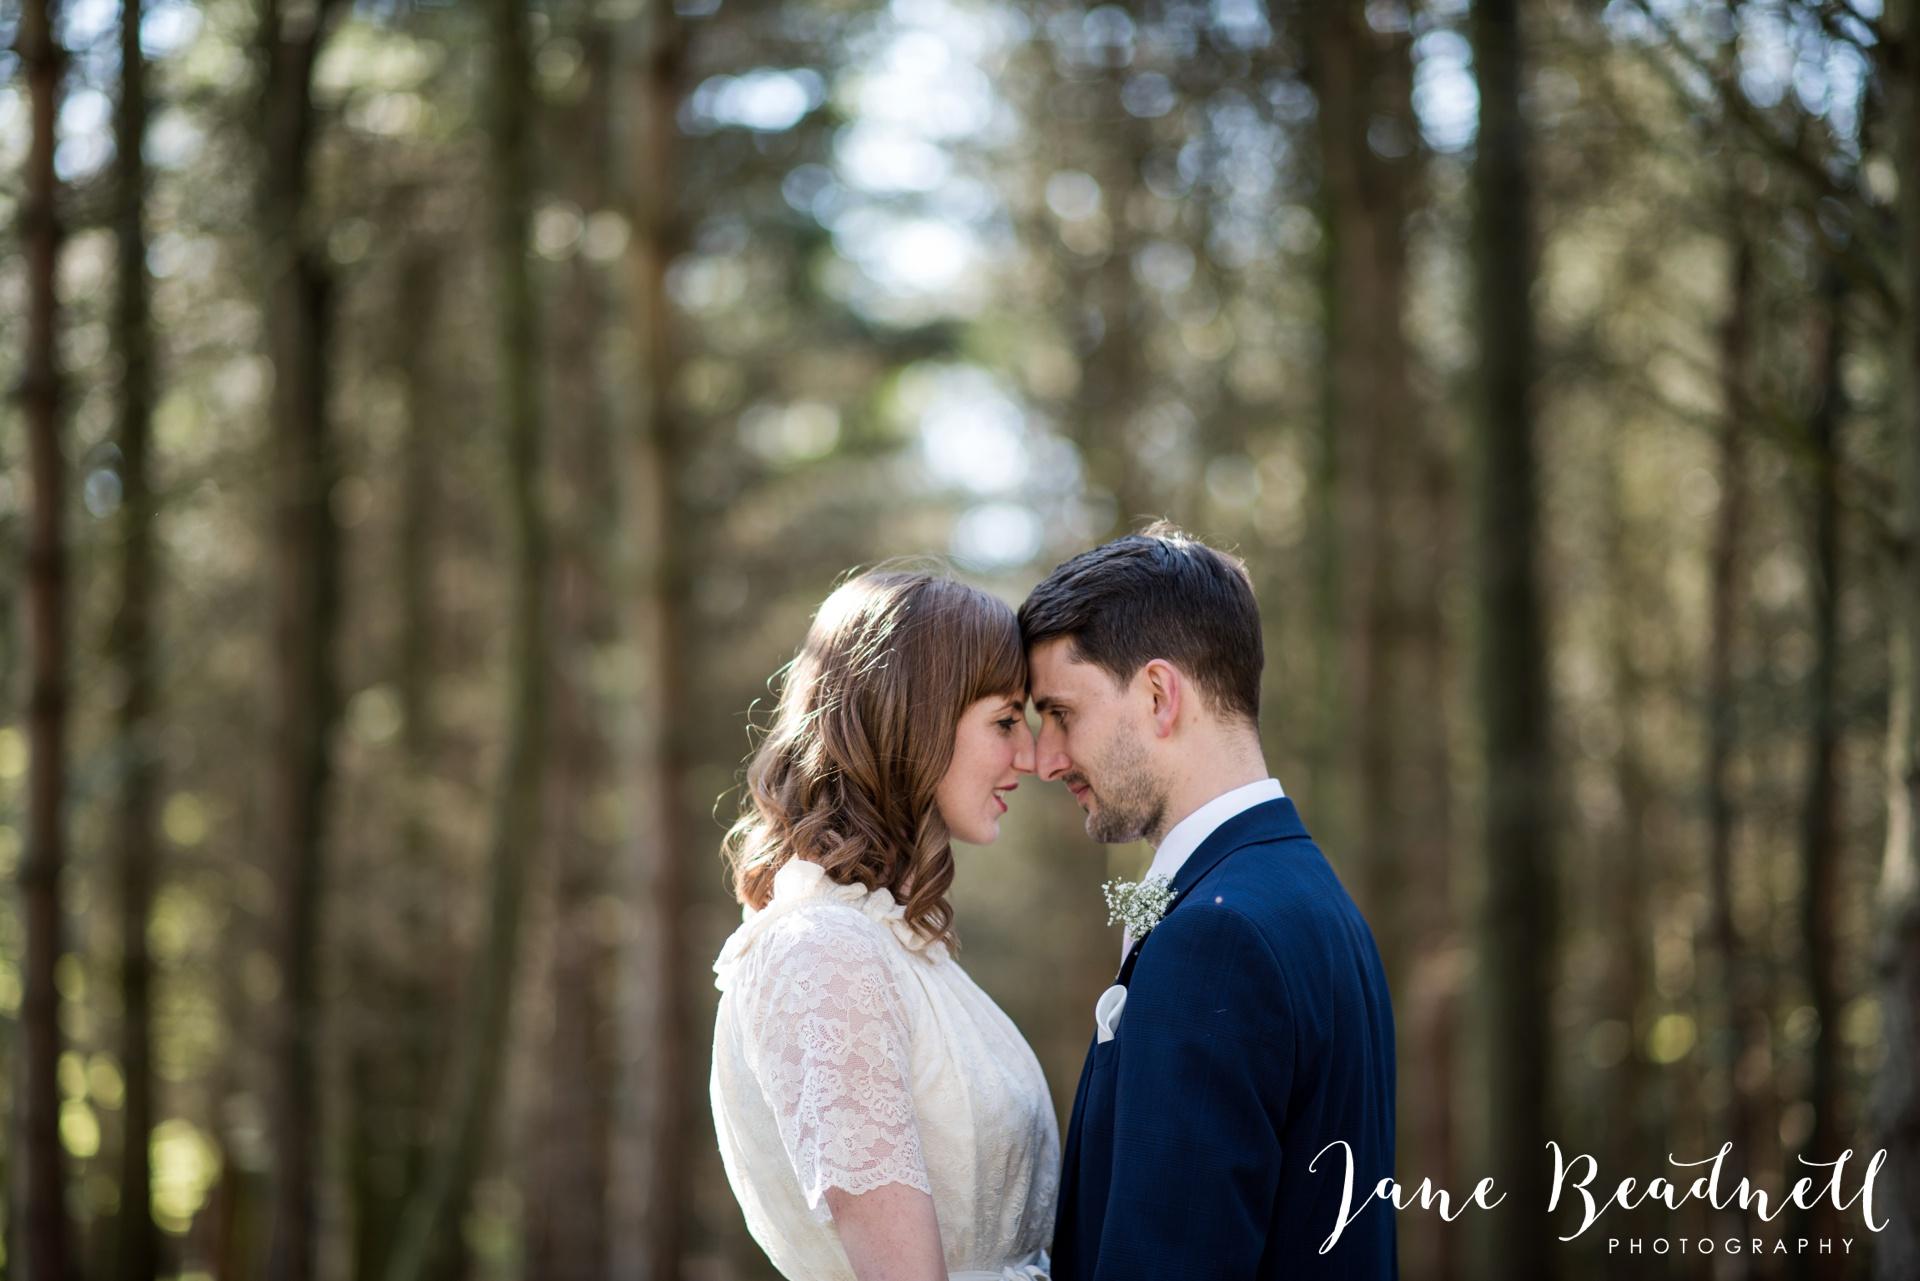 Jane Beadnell fine art wedding photographer The Cheerful Chilli Barn Otley_0034